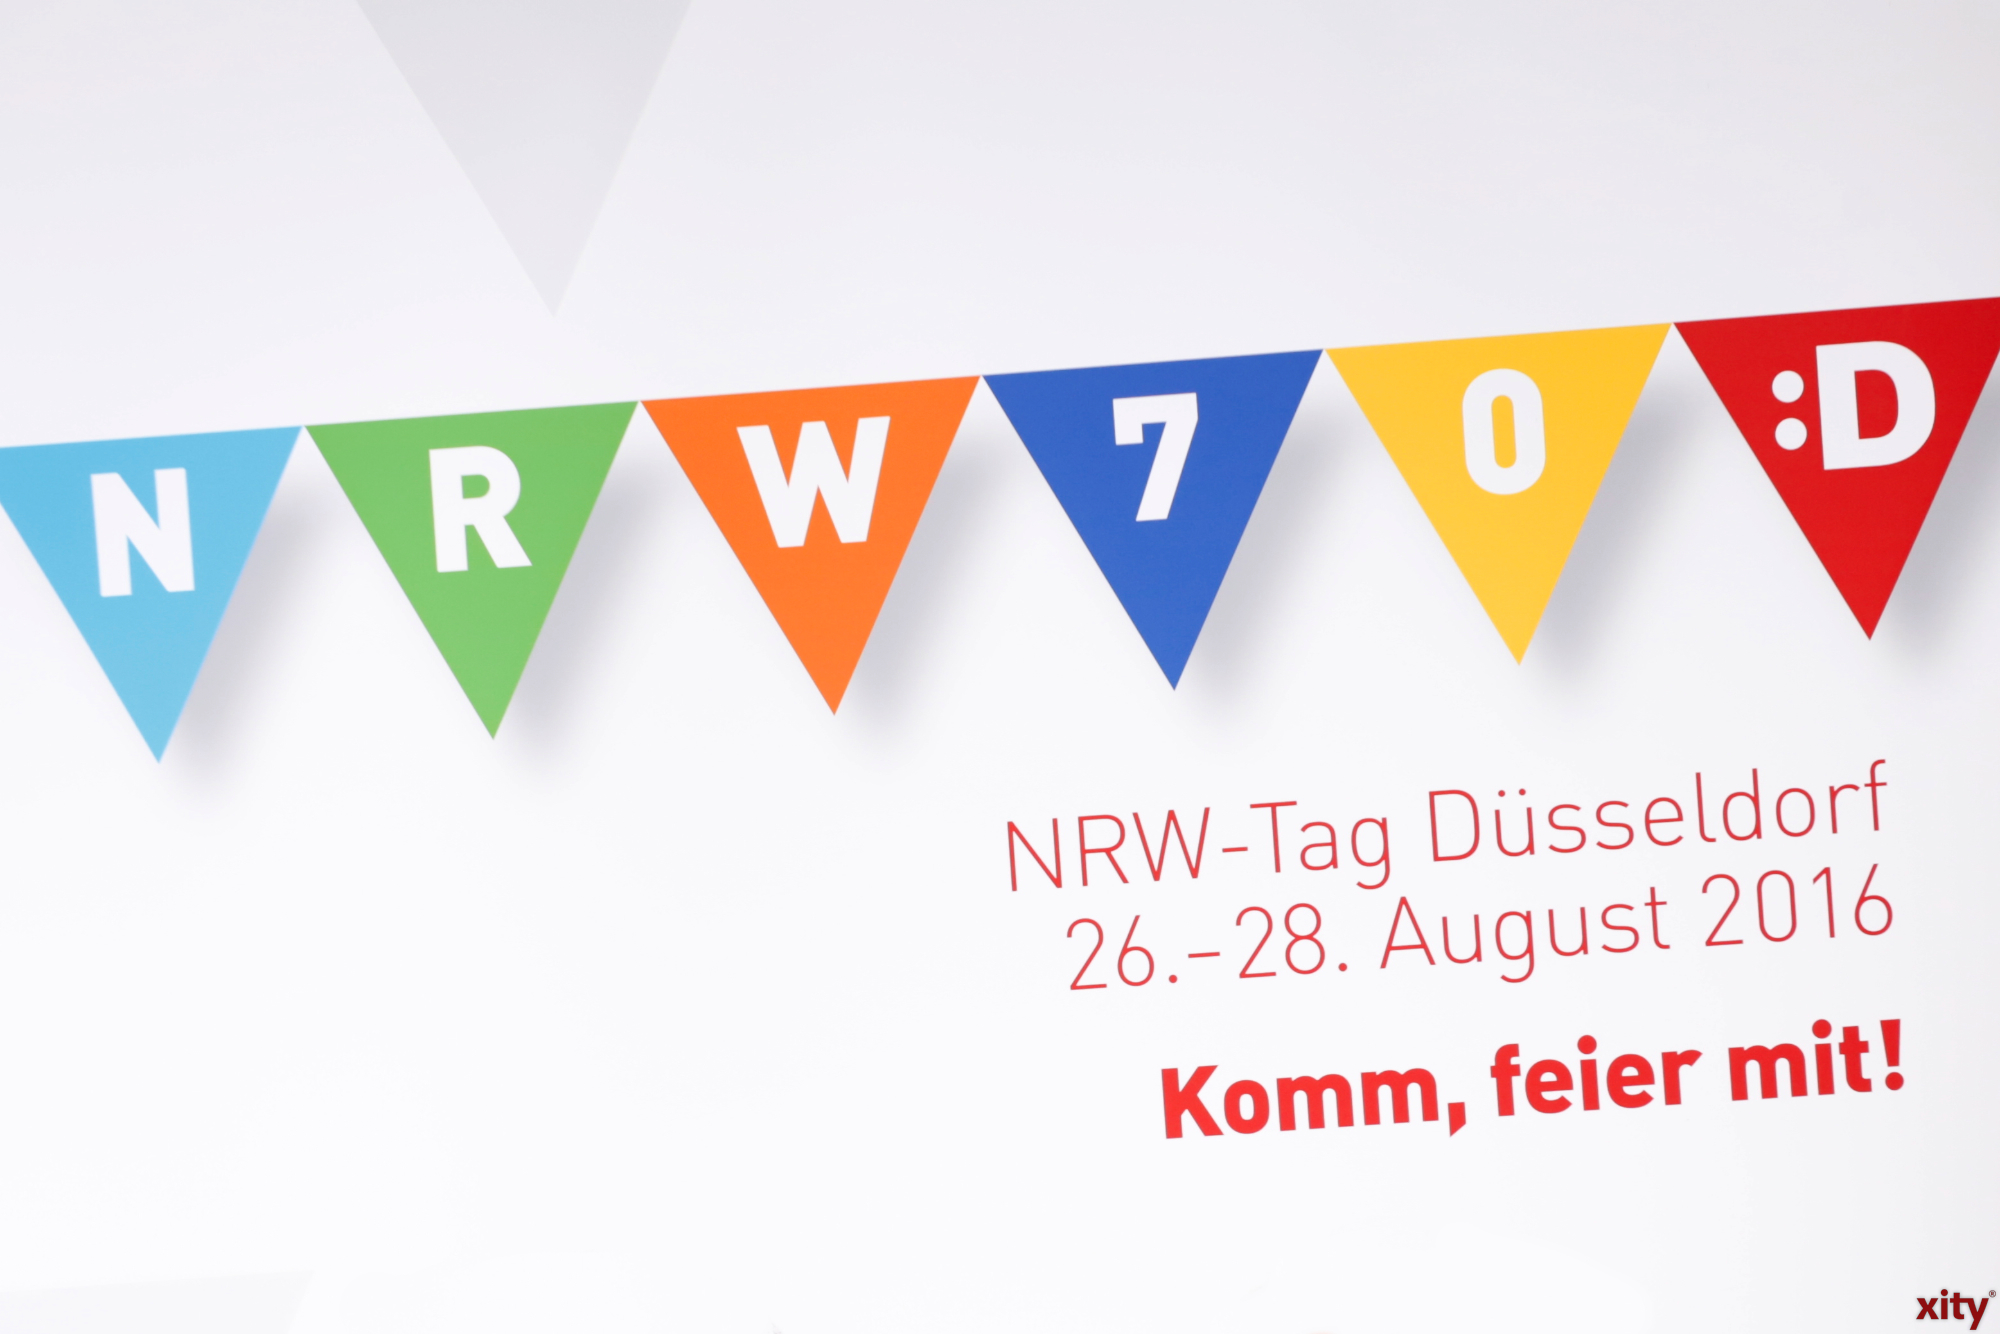 NRW-Tag 2016 in Düsseldorf rückt näher (Foto: xity)